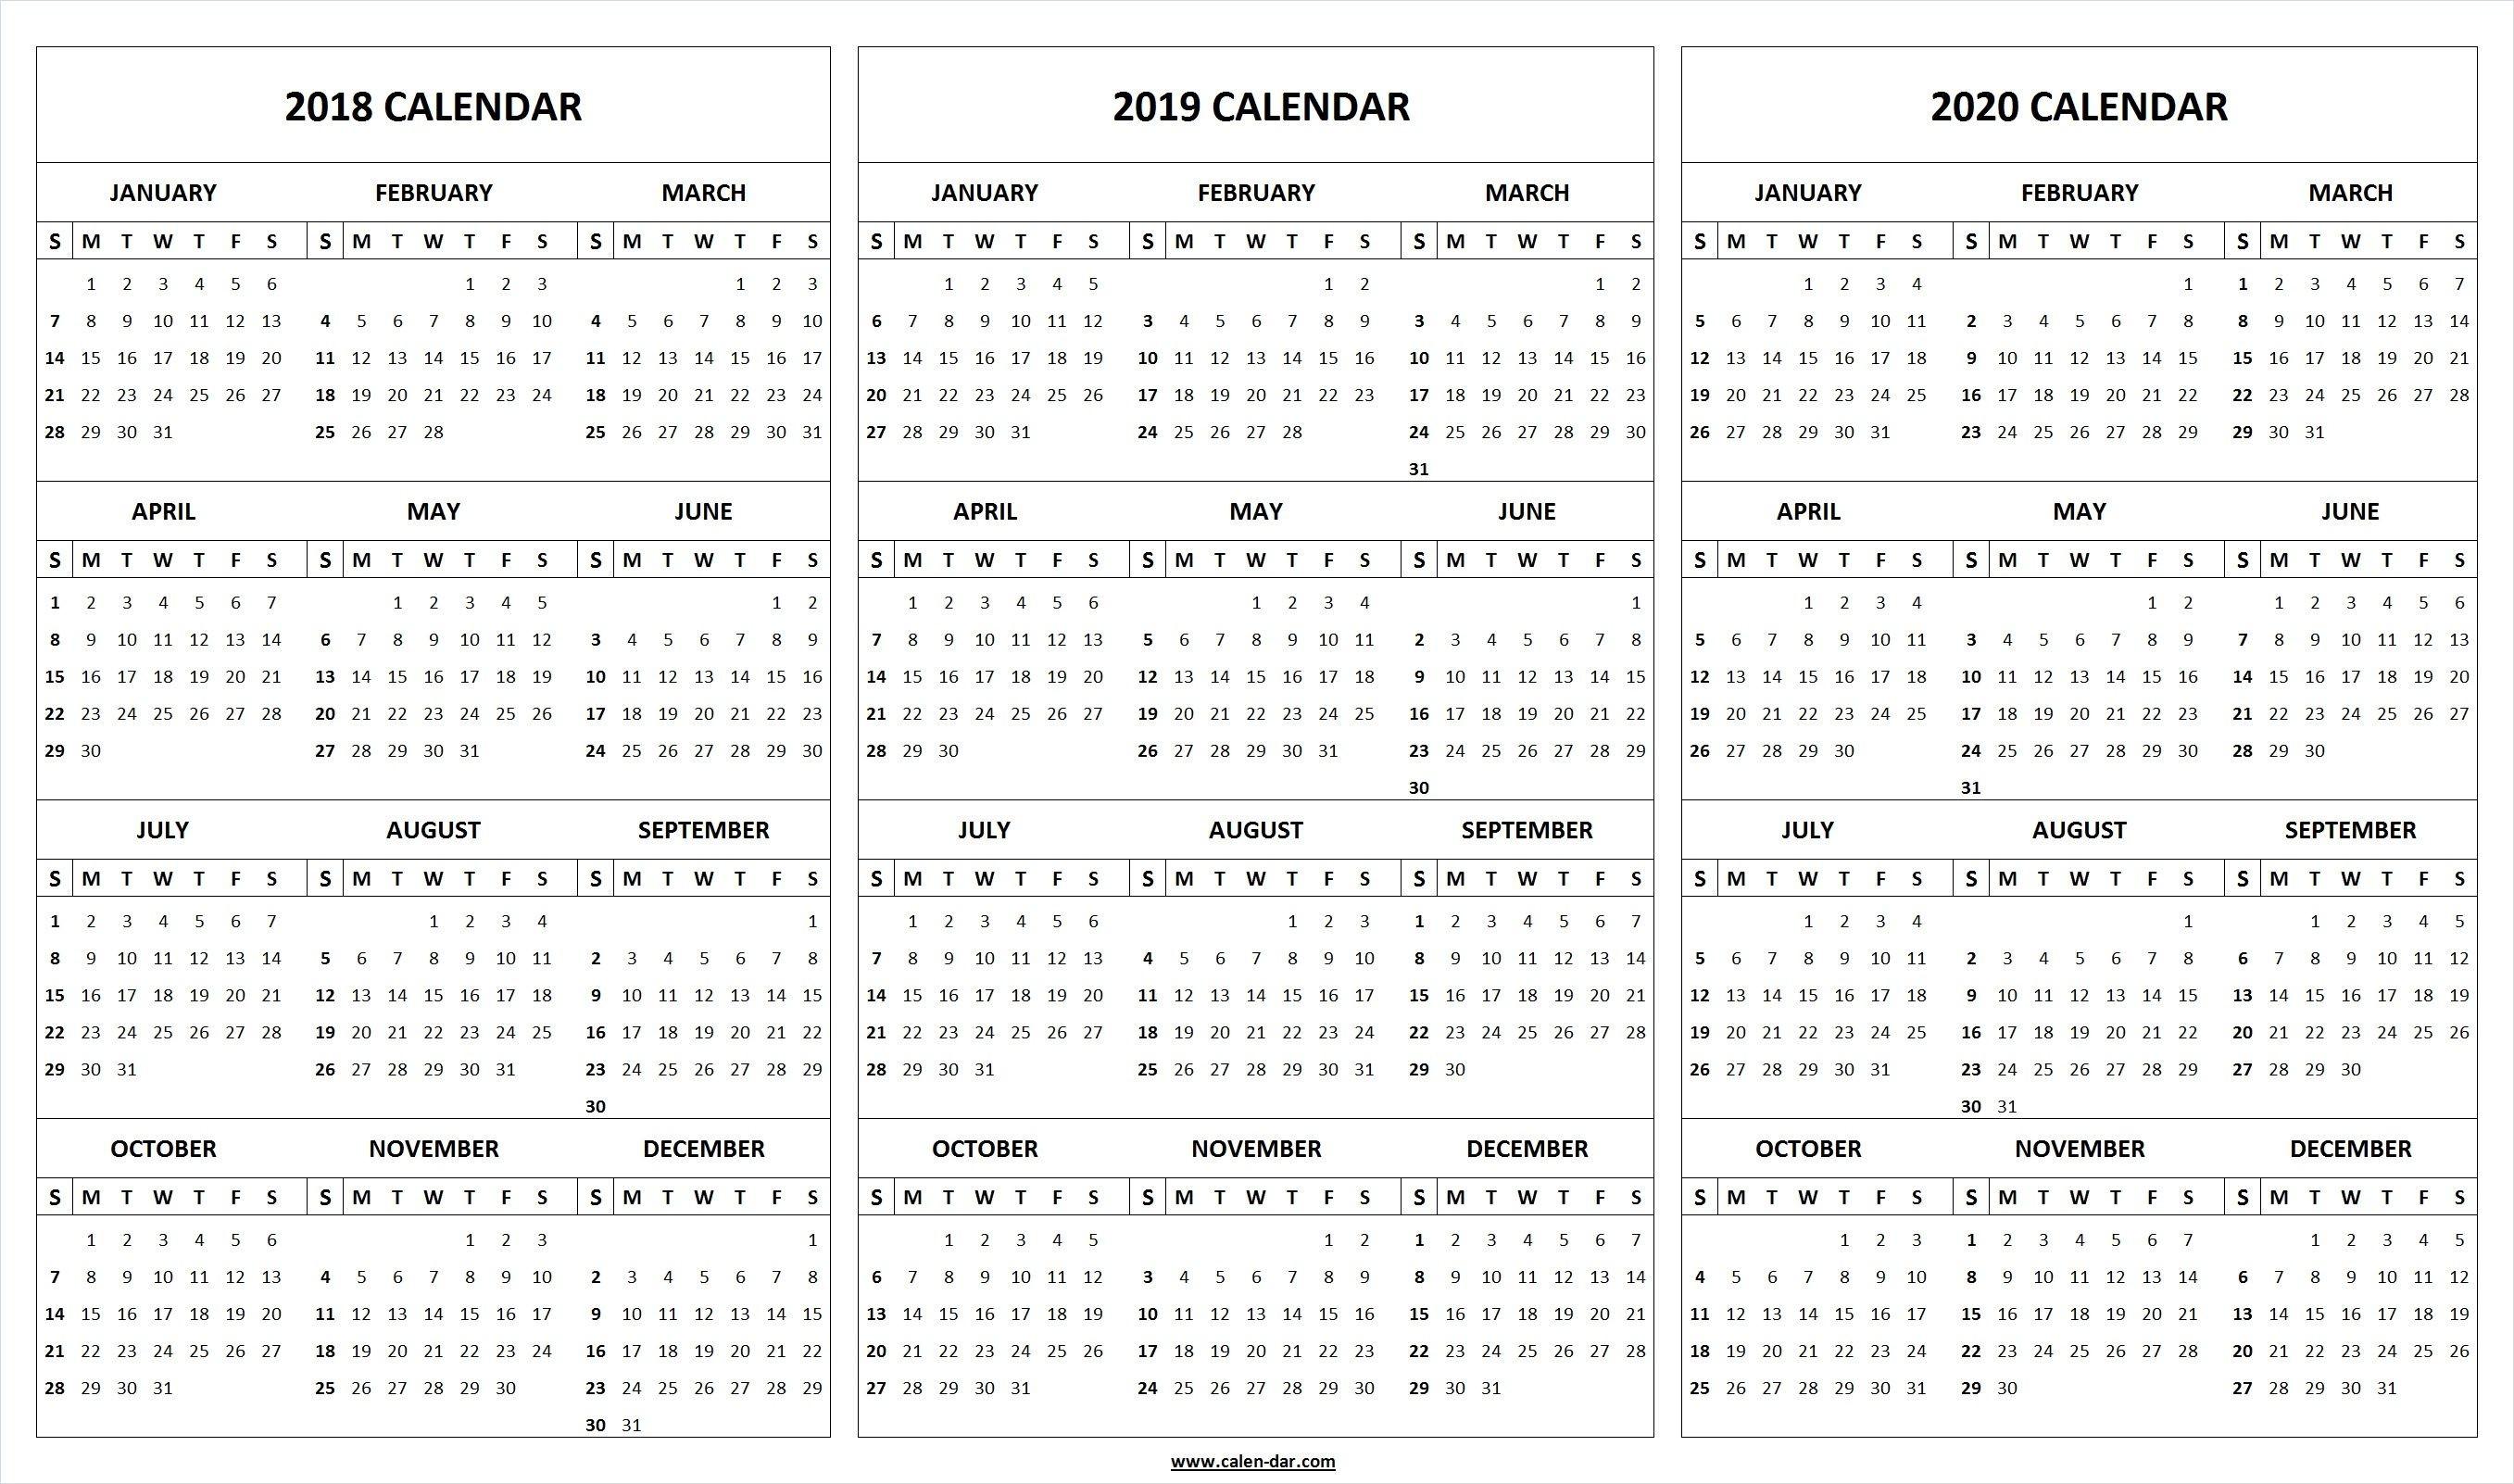 Print Blank 2018 2019 2020 Calendar Template | Organize-Fiscal Year 2020 Academic Calendar Template